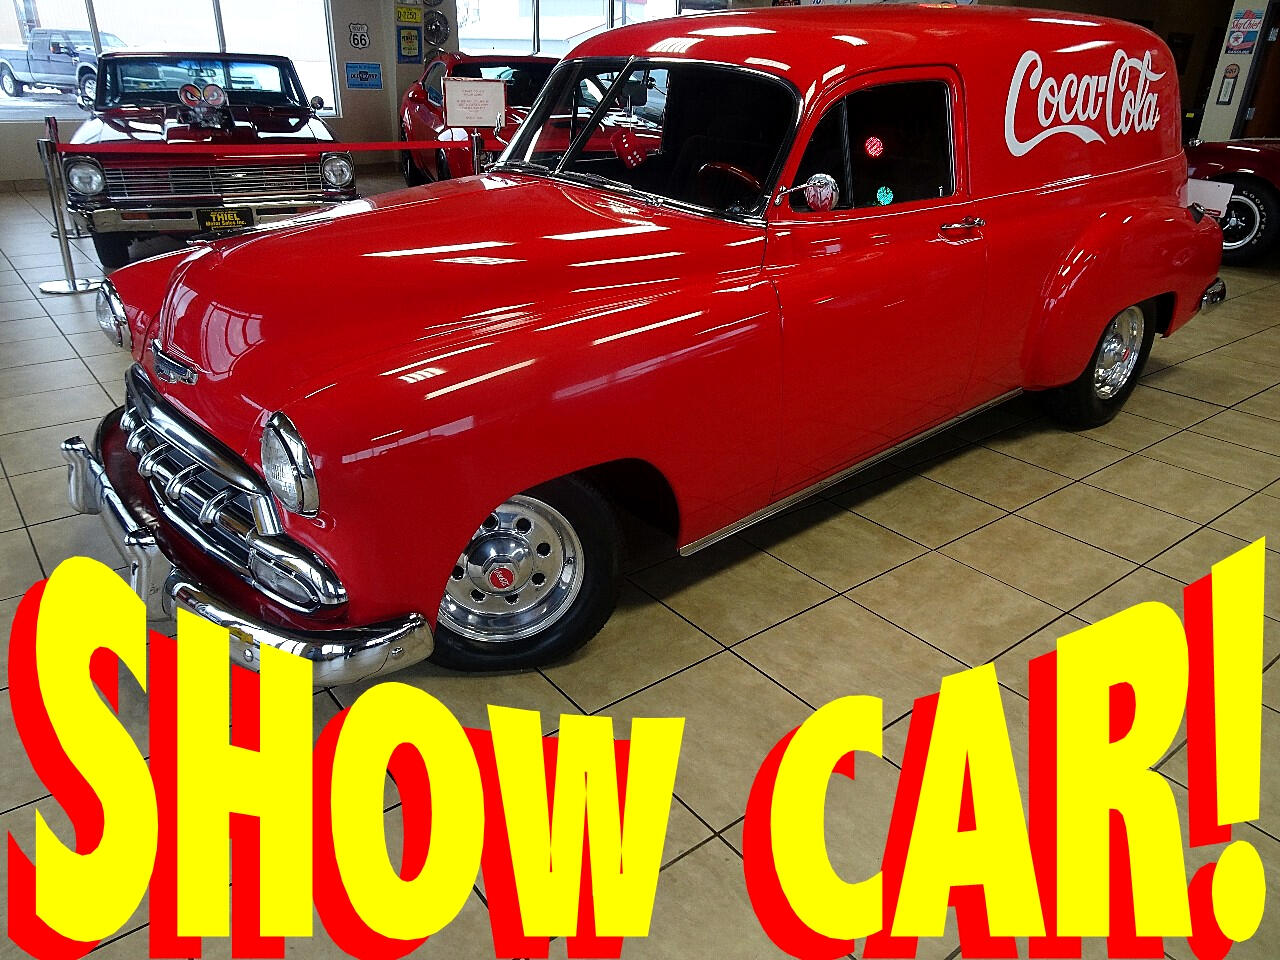 1952 Chevrolet Sedan Delivery Coke Themed